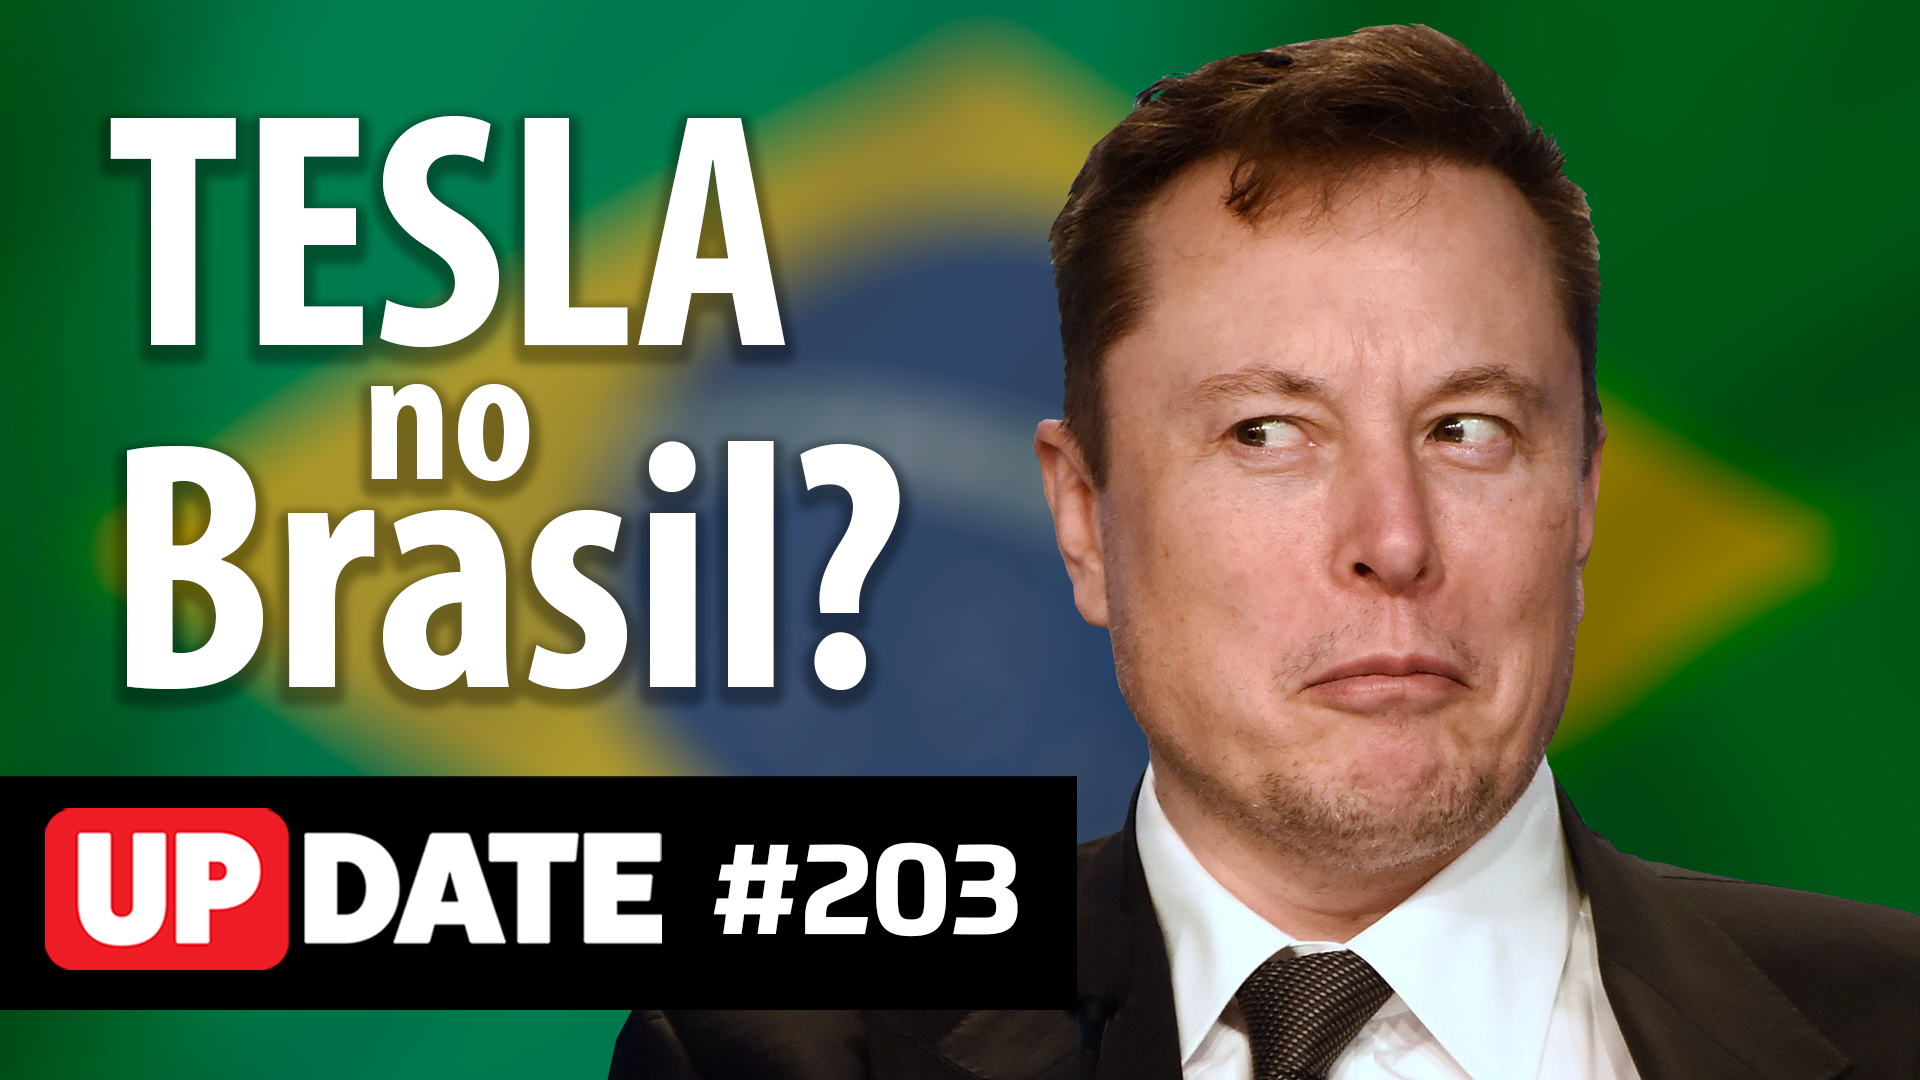 Update 203 – Fábrica da Tesla no Brasil